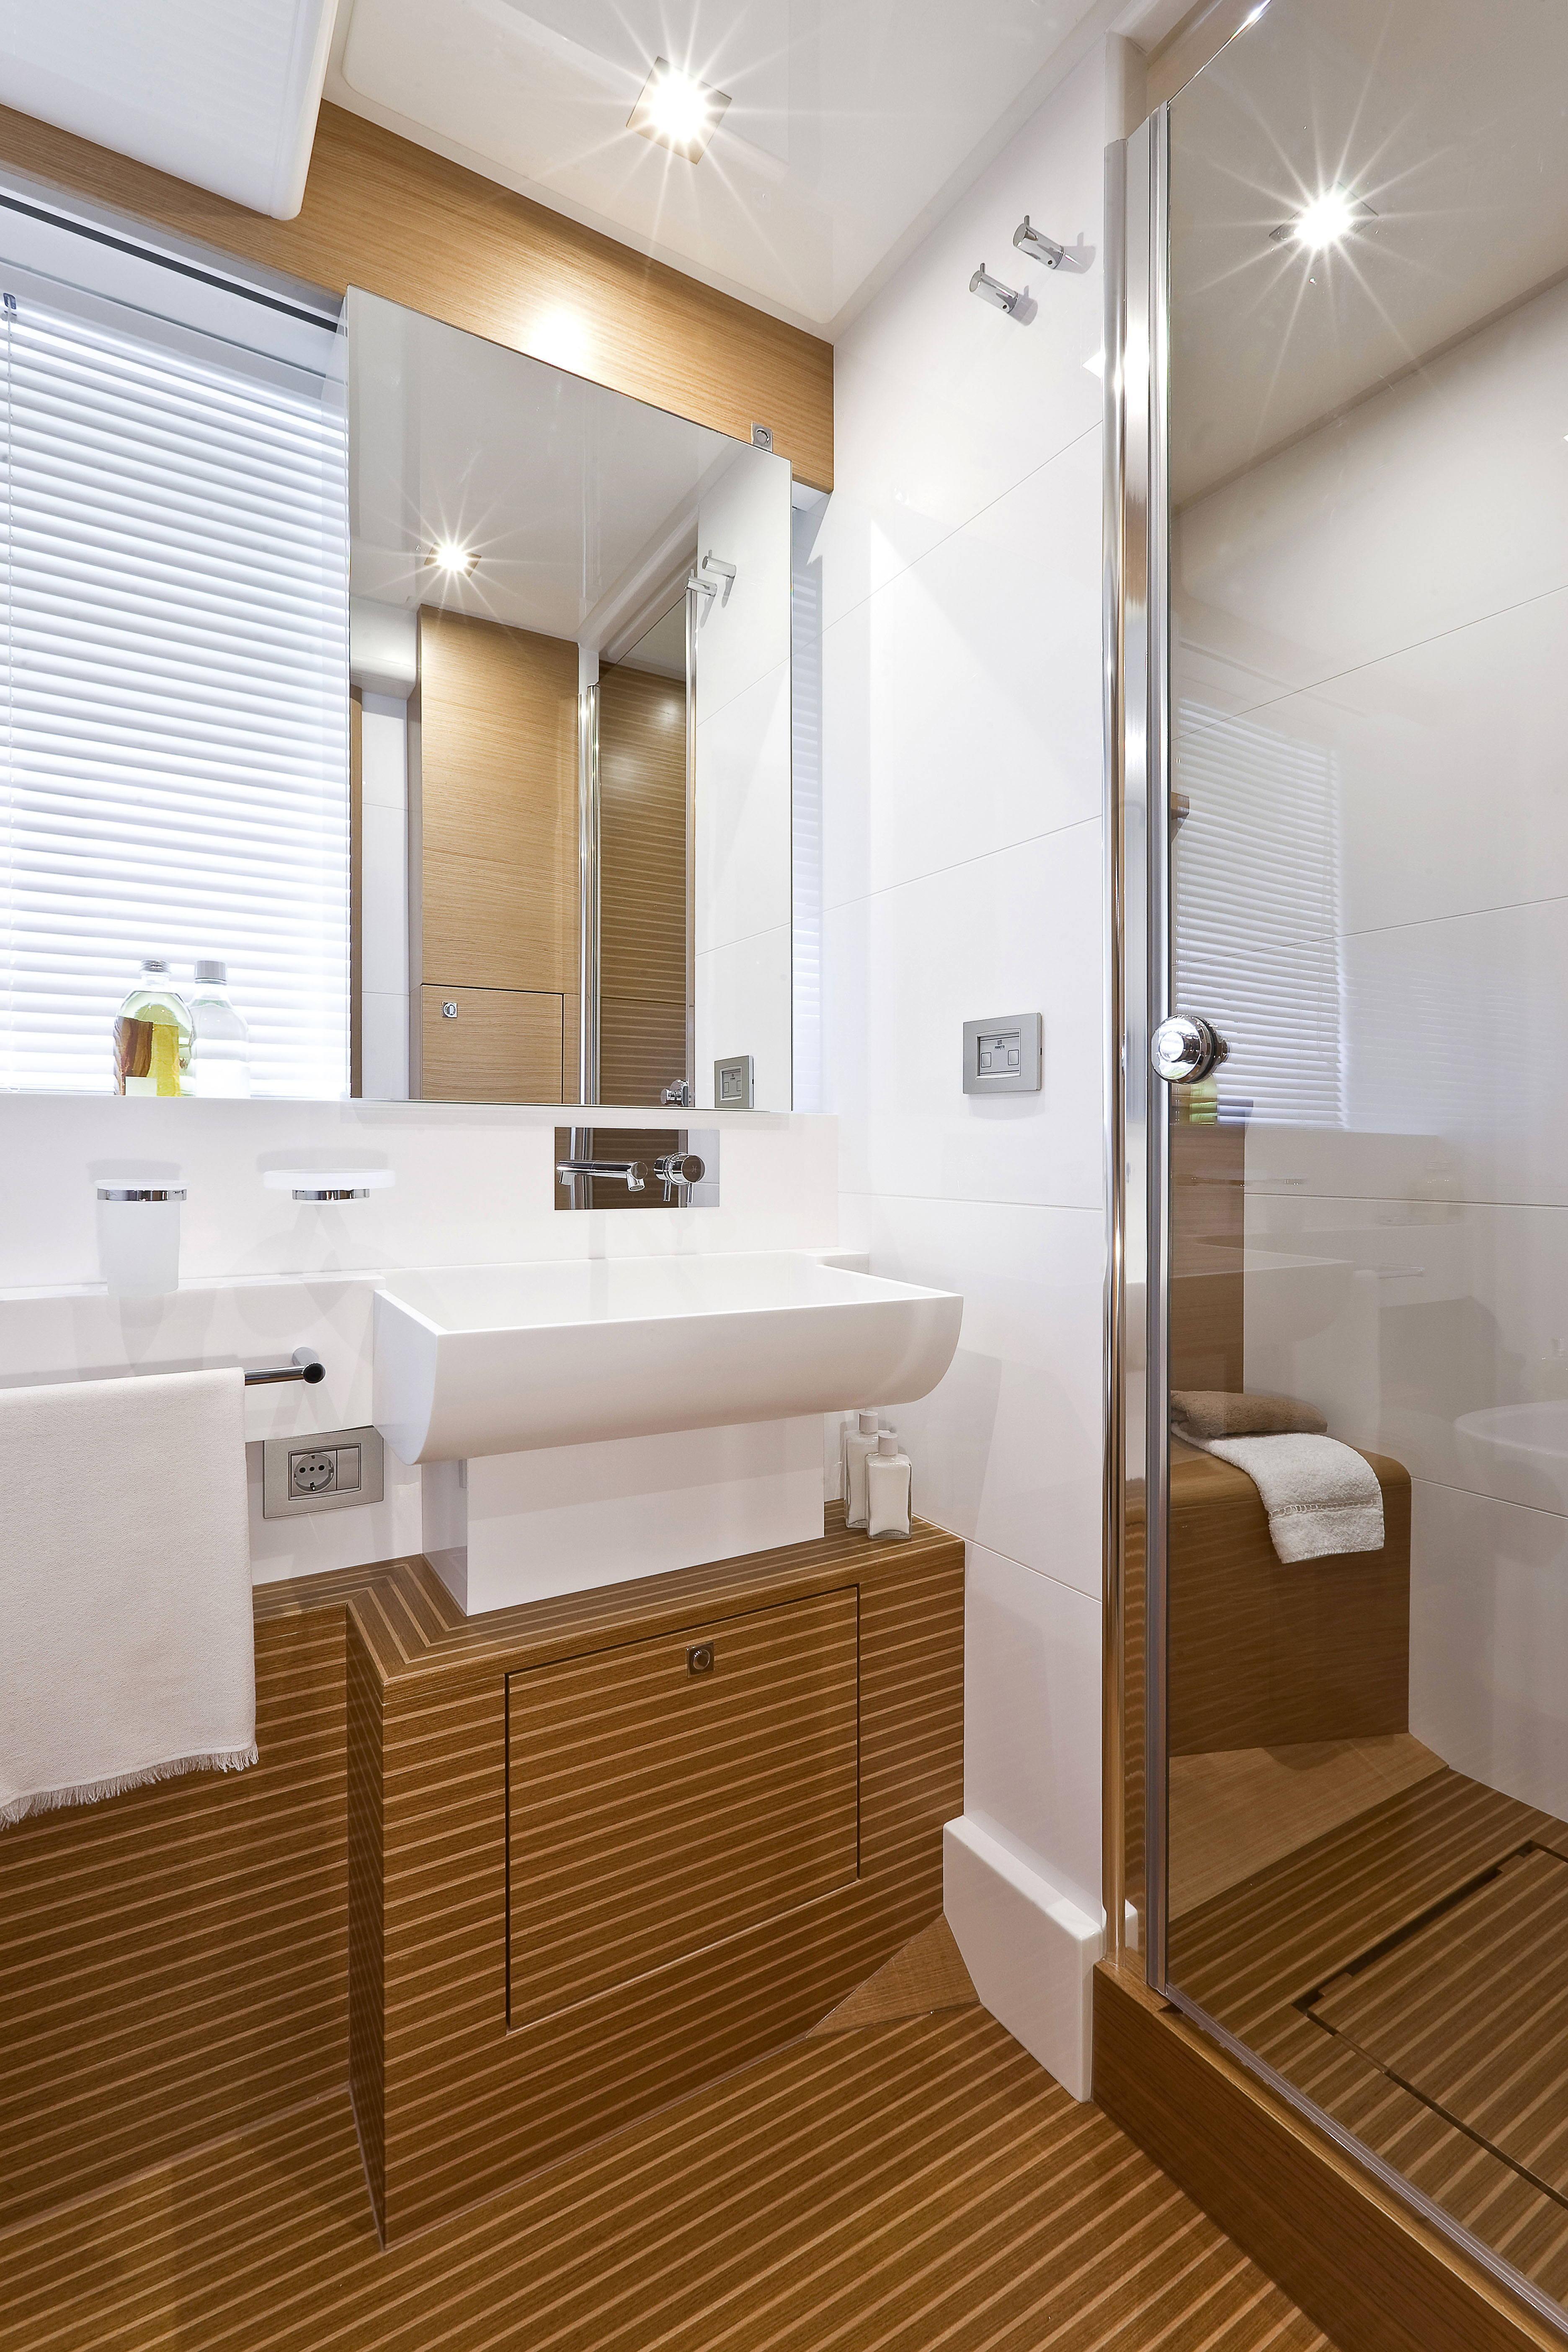 Manufacturer Provided Image: Ferretti 830 Bathroom